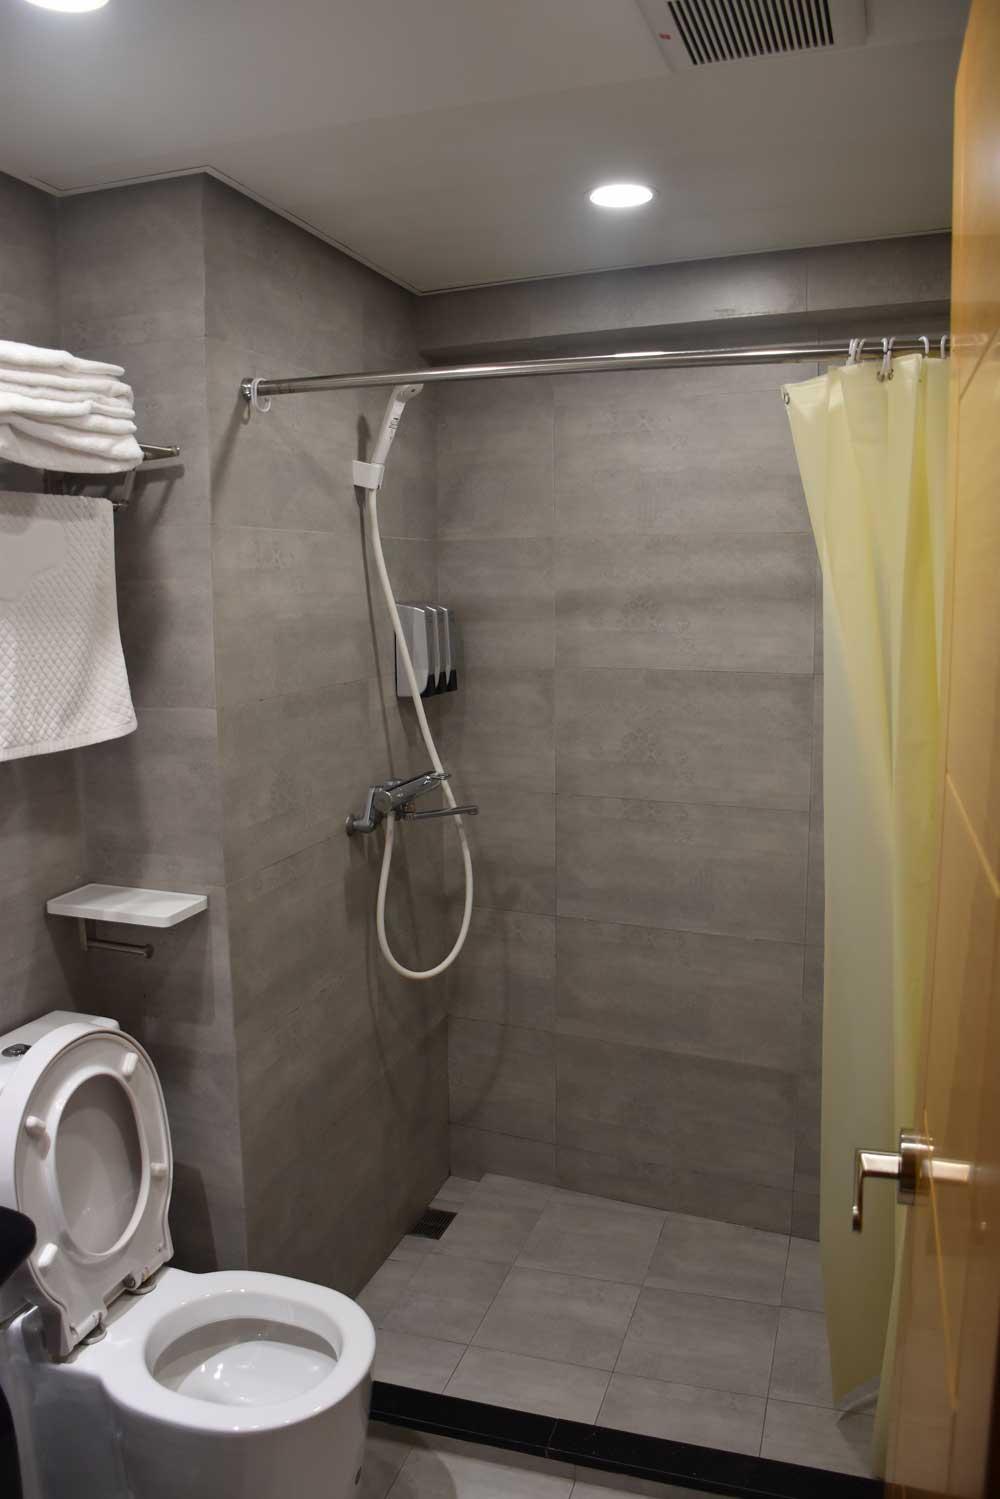 Macau Budget Hotels San Tung Fong Commercial Inn shower